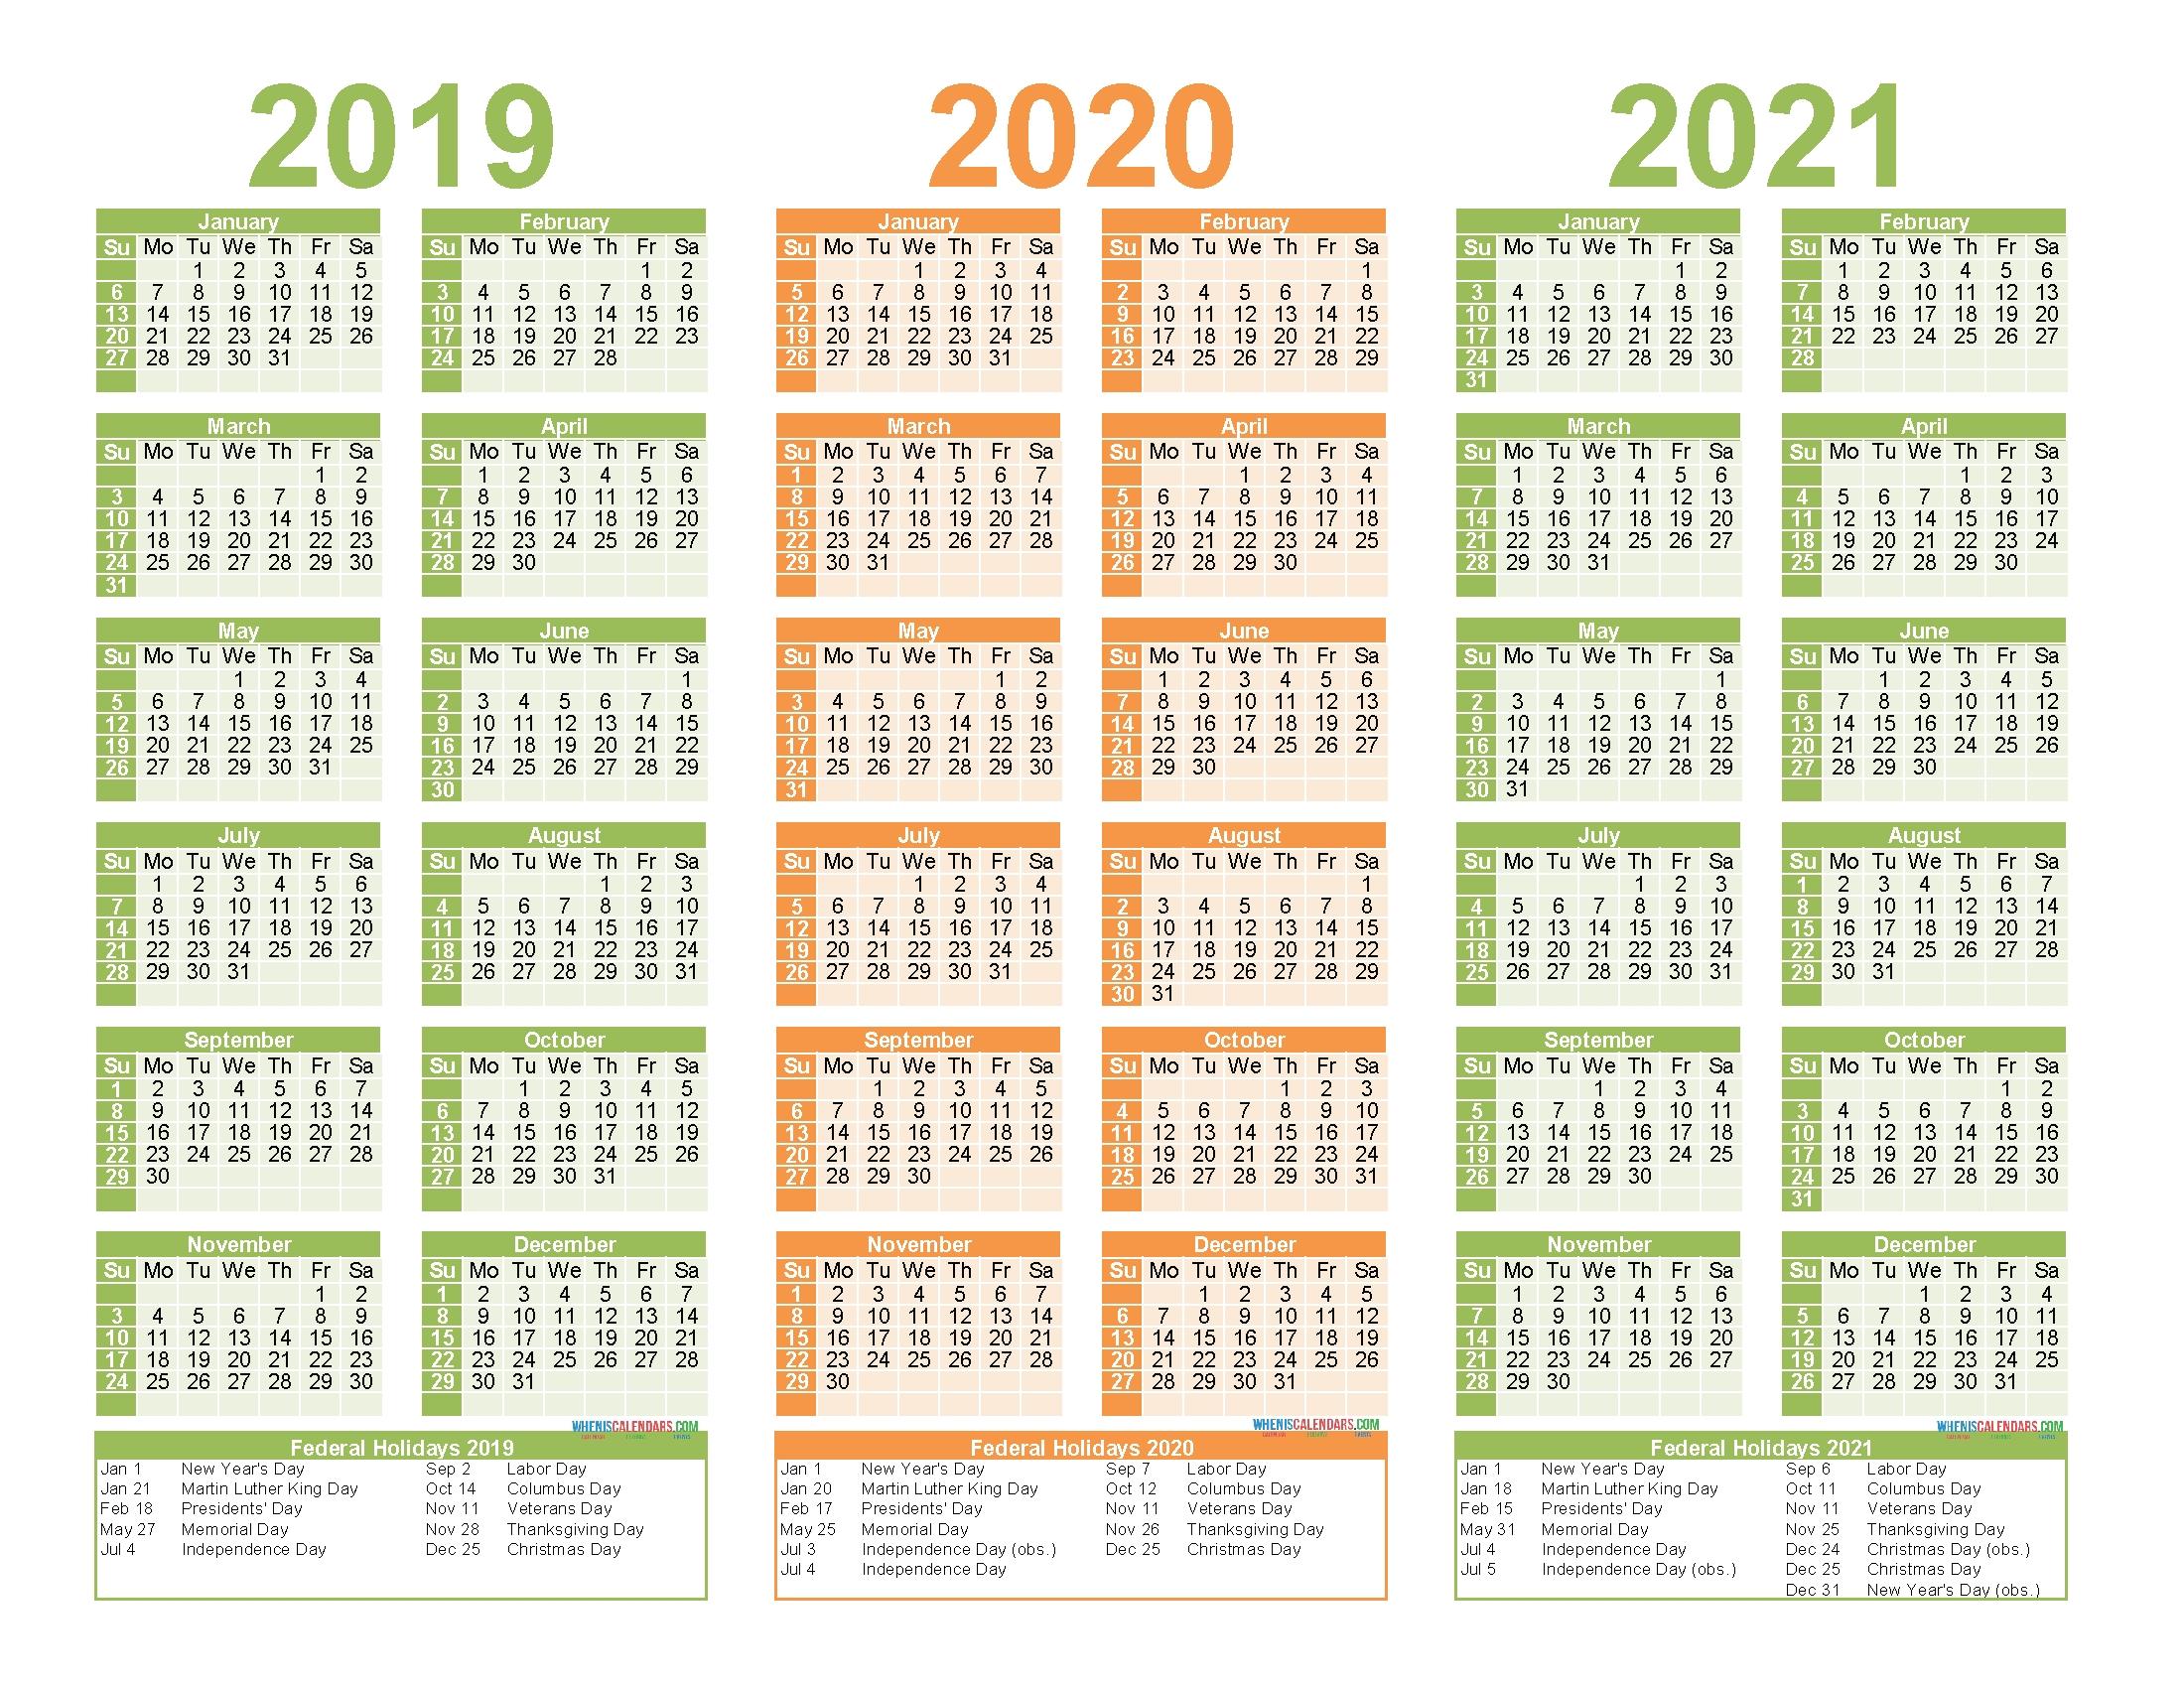 2019 To 2021 Calendar Printable Free Pdf, Word, Image | Free with regard to 2019 2020 2021 Printable Calendar